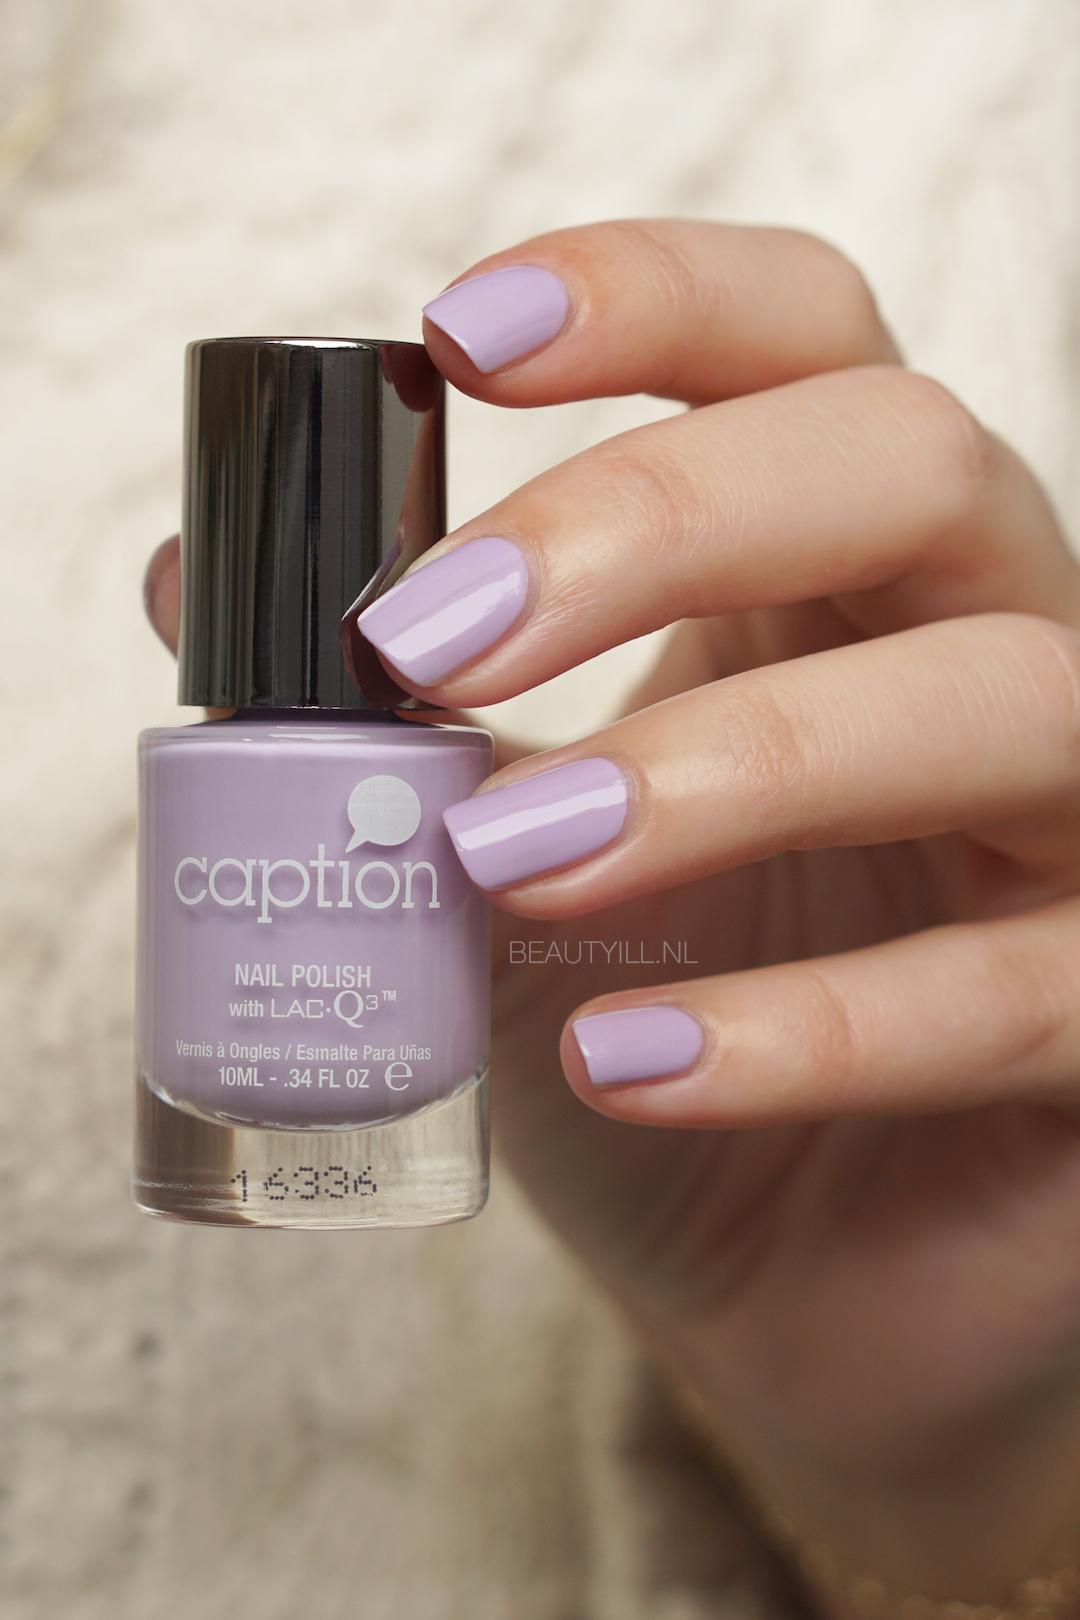 CAPTION RESORT SPRING/SUMMER 17 COLLECTION